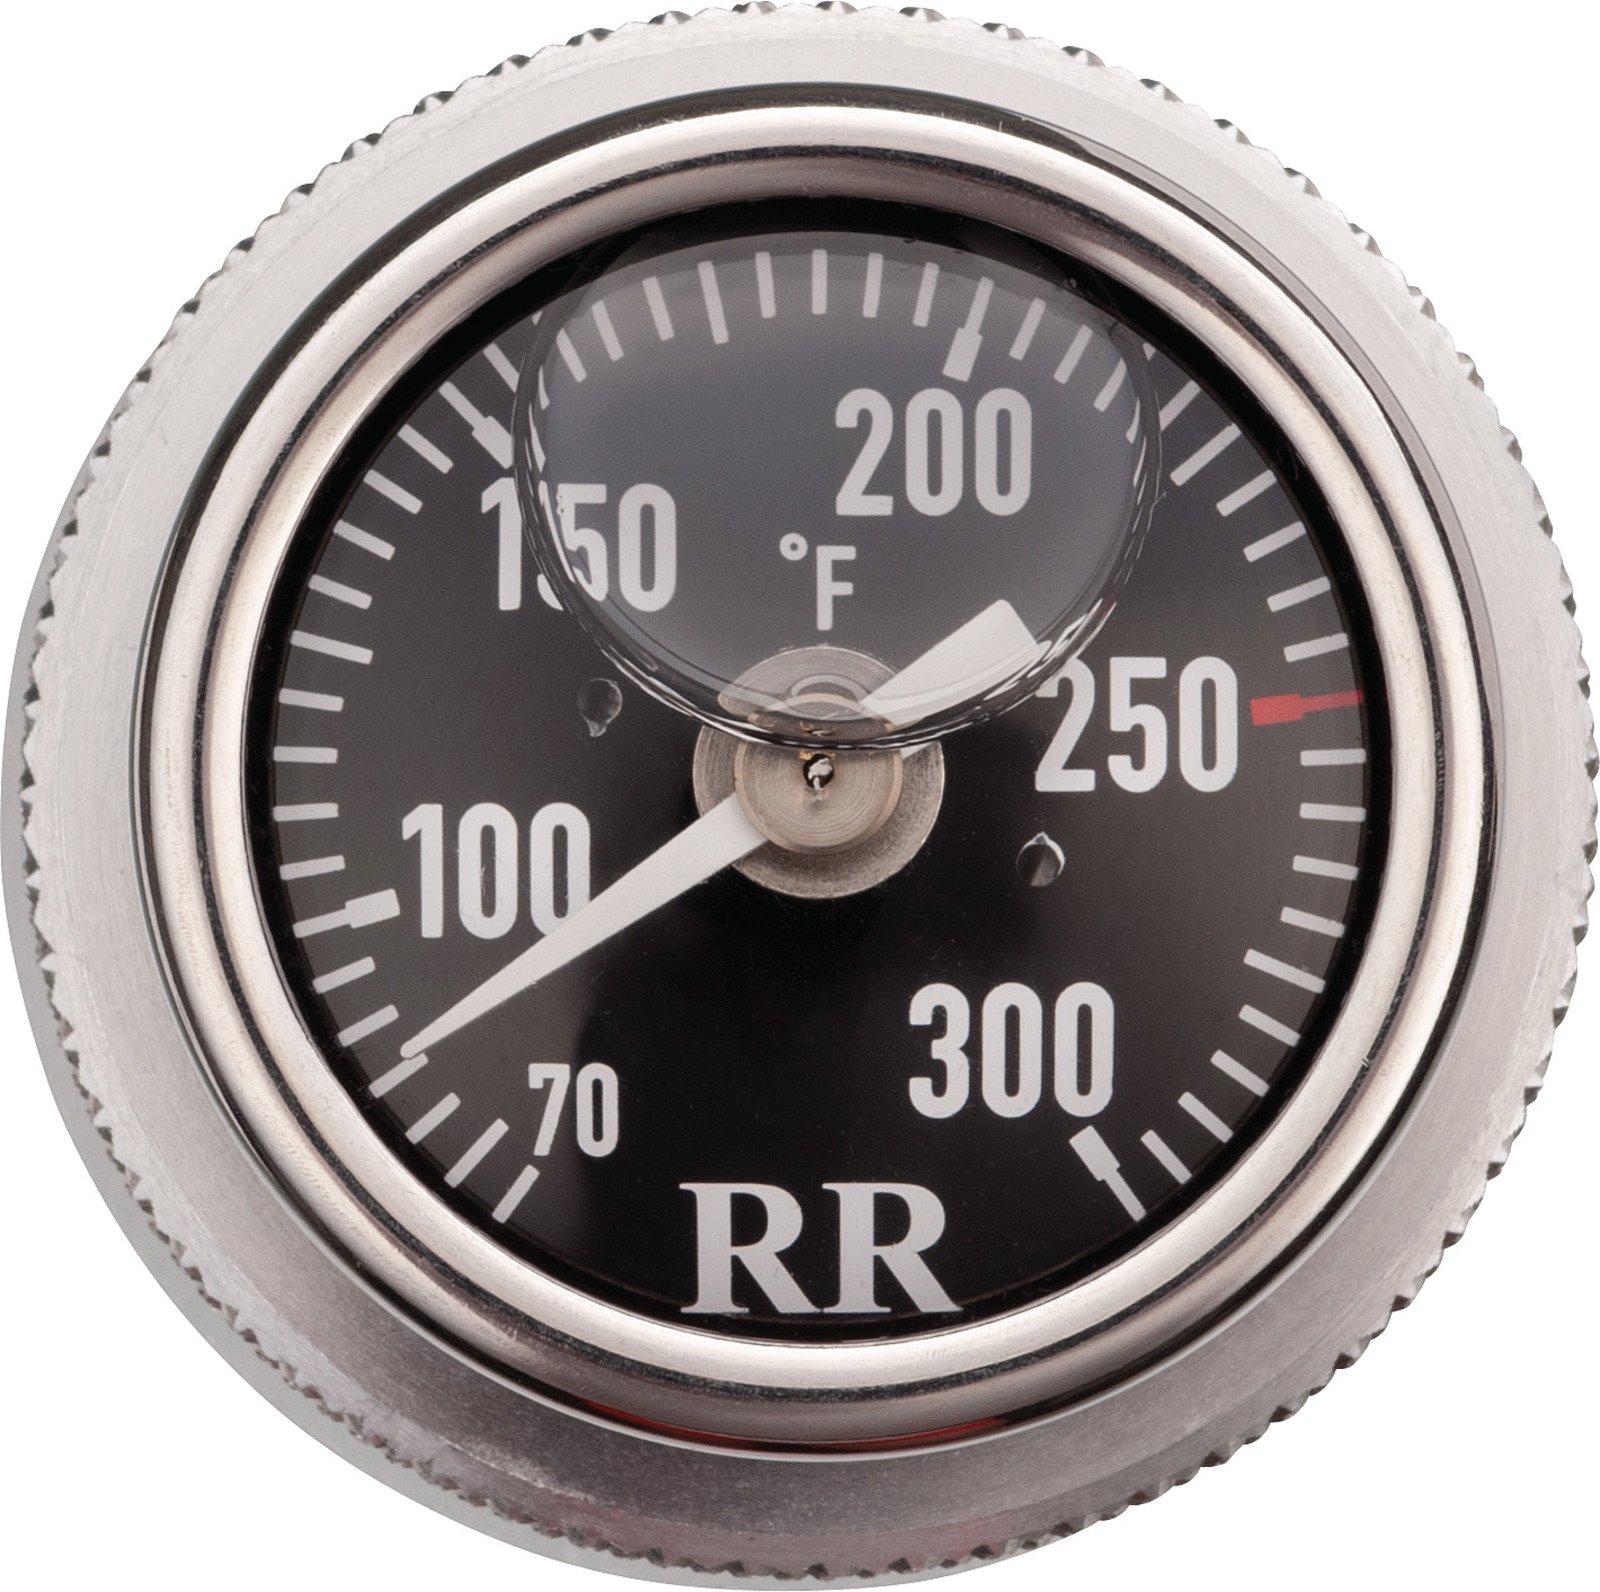 Oil Dipstick Thermometer Gauge for Yamaha SR400, SR500, TT500, XT500, Fahrenheit, Black Face, B-053